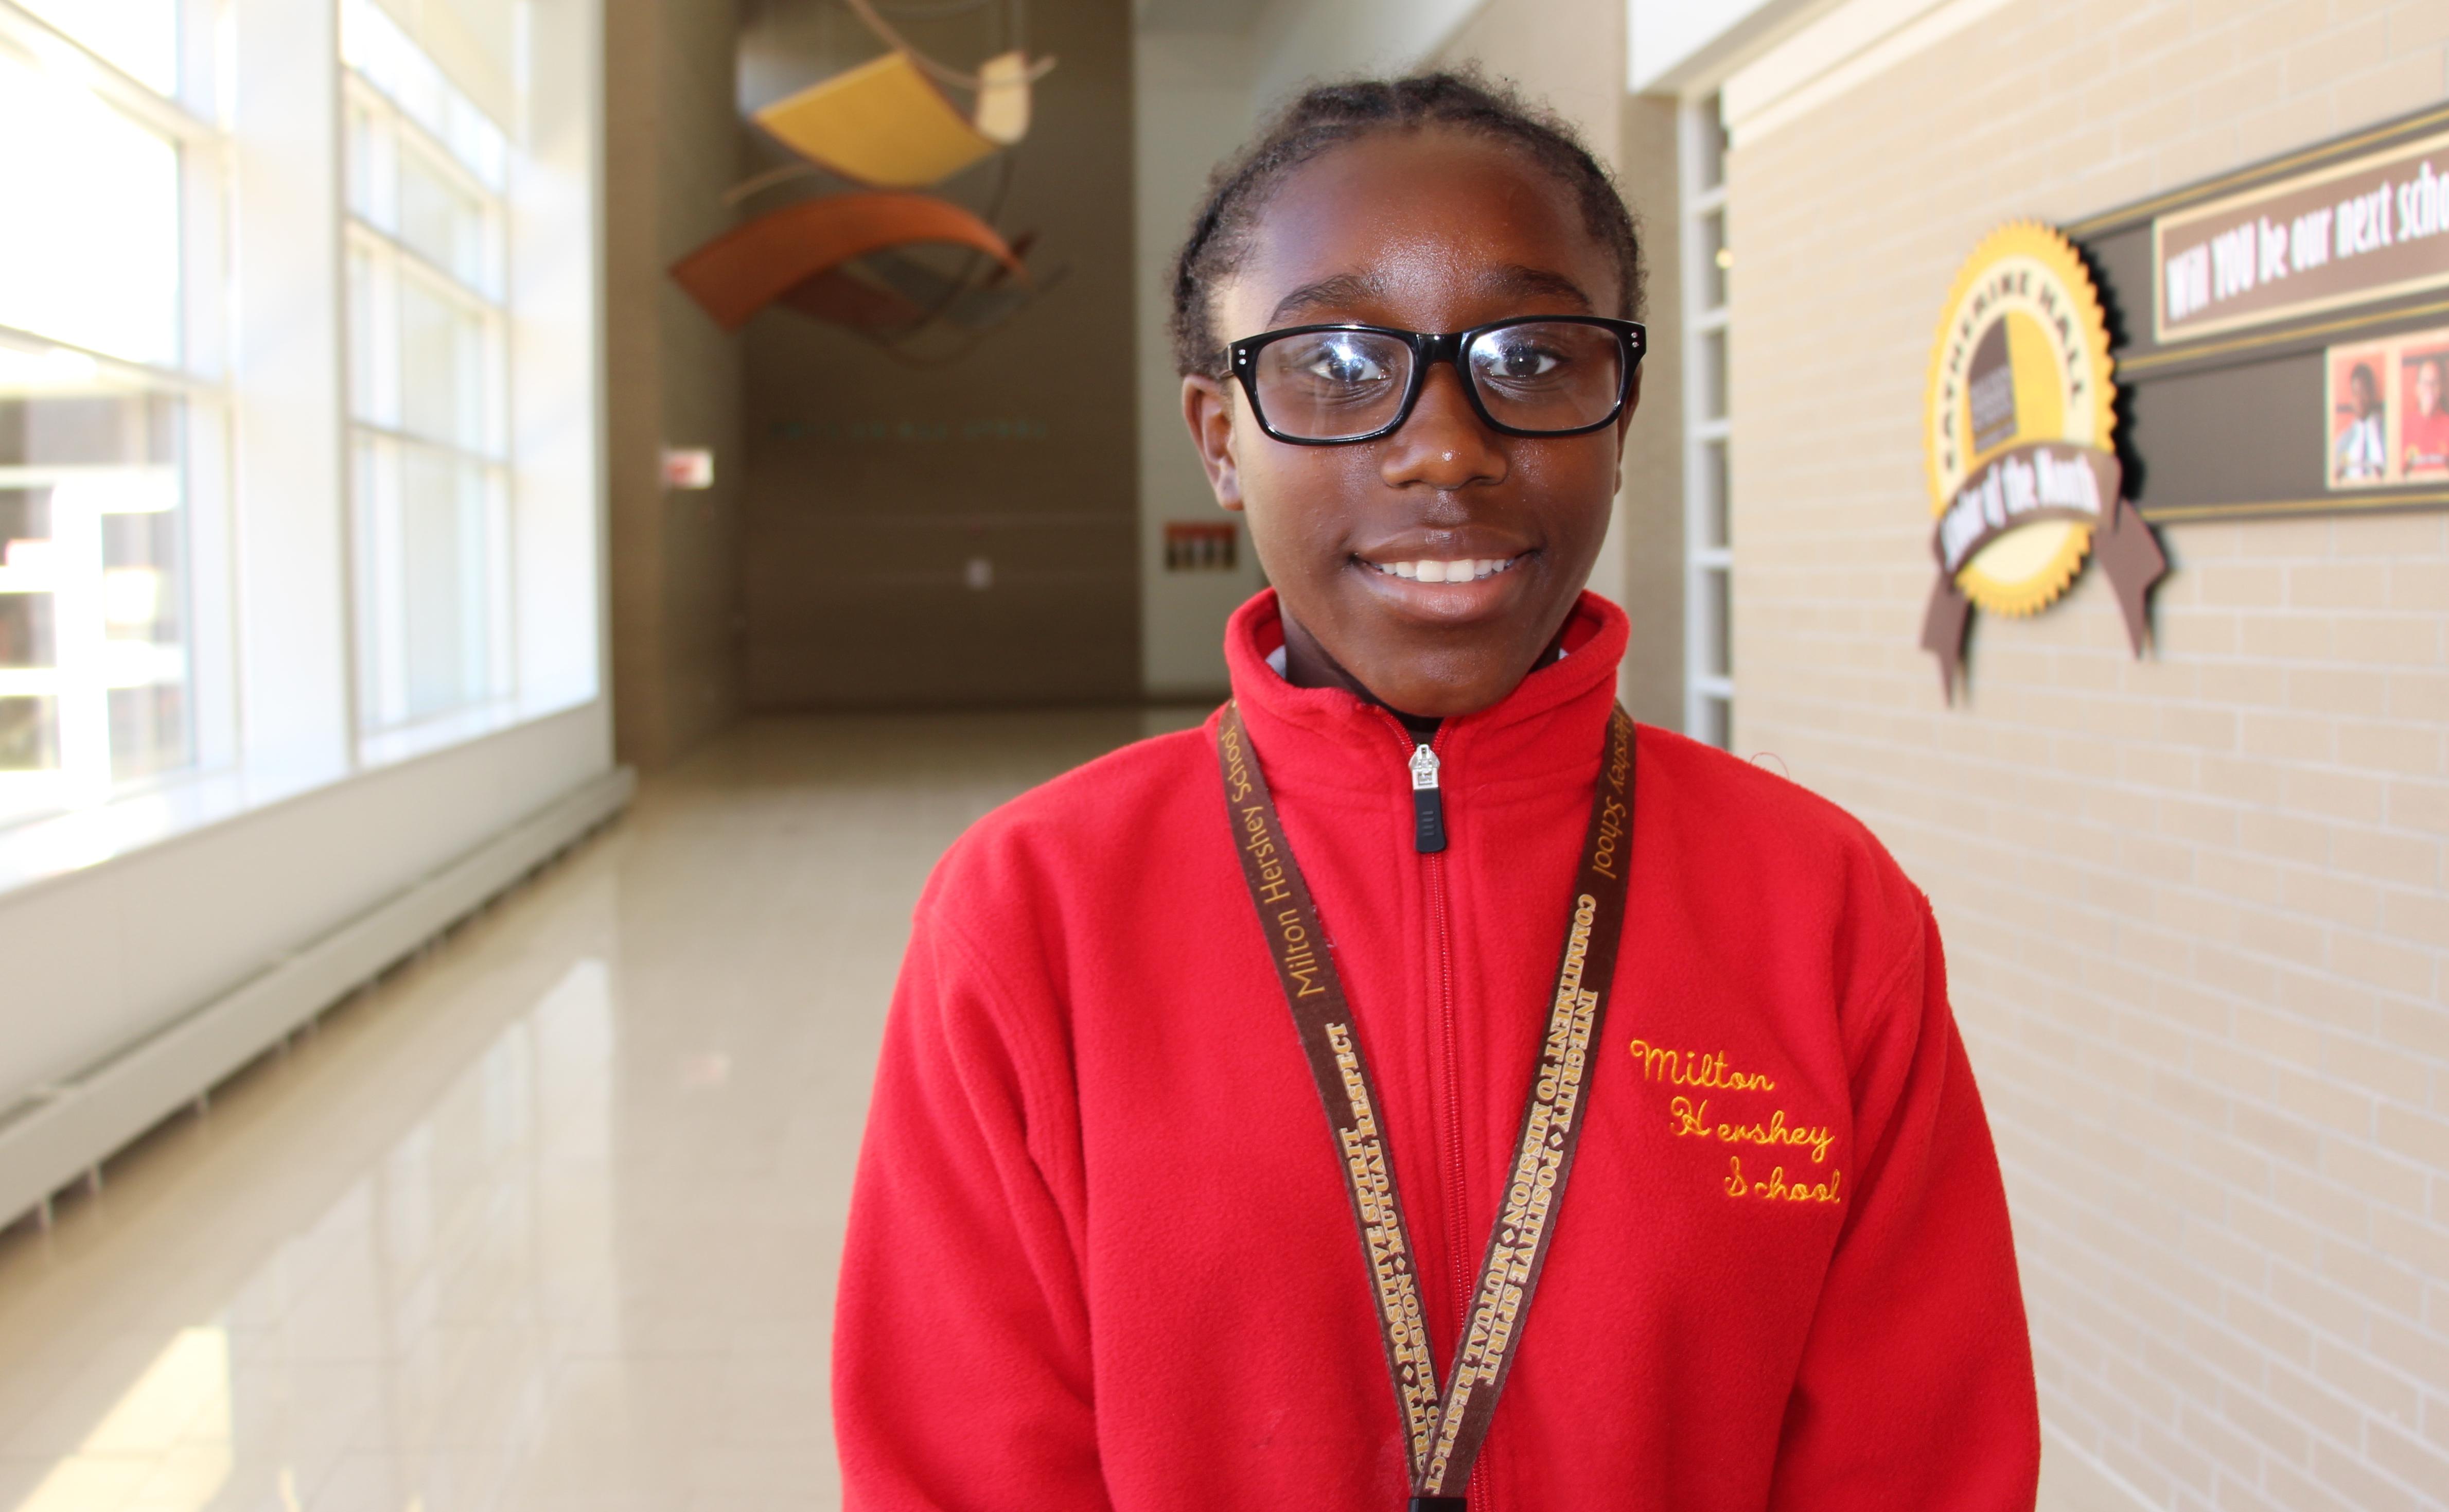 Brianna, a seventh grader